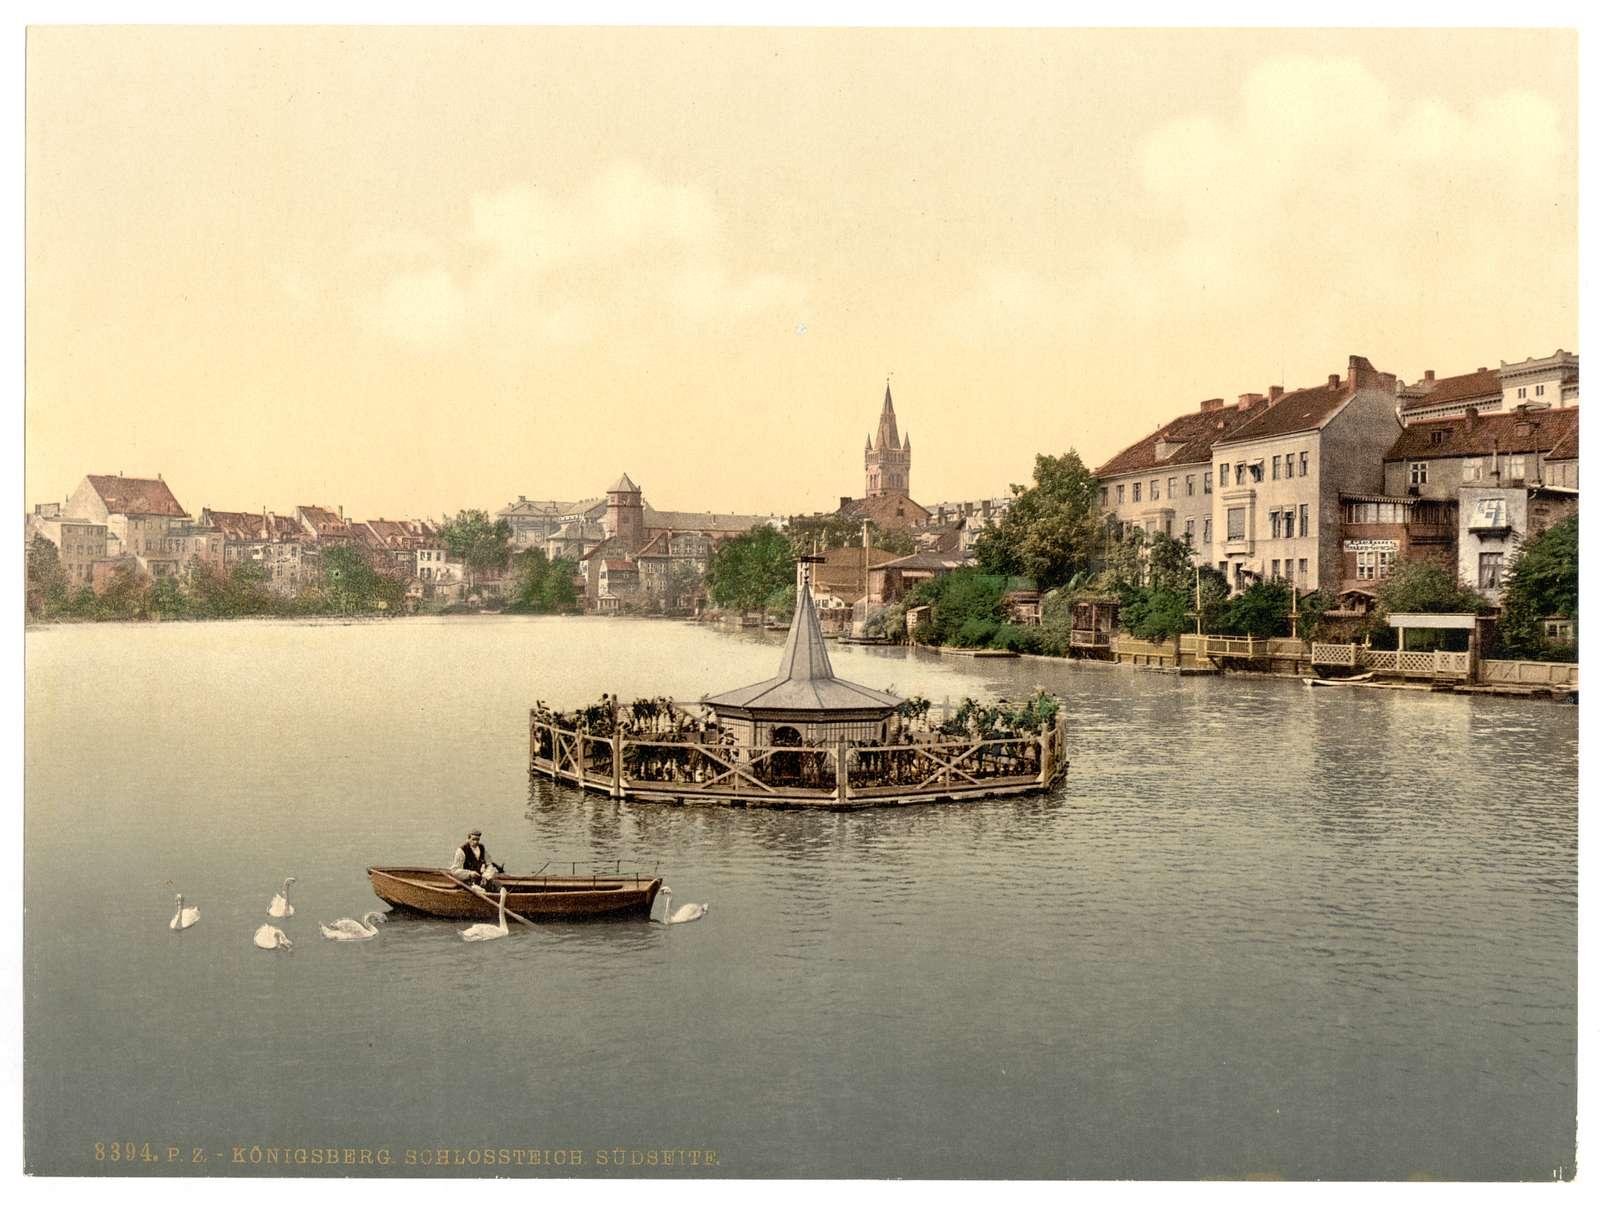 [The lake, south side, Konigsberg, East Prussia, Germany (i.e., Kaliningrad, Kaliningradskai︠a︡ oblastʹ, Russia)]